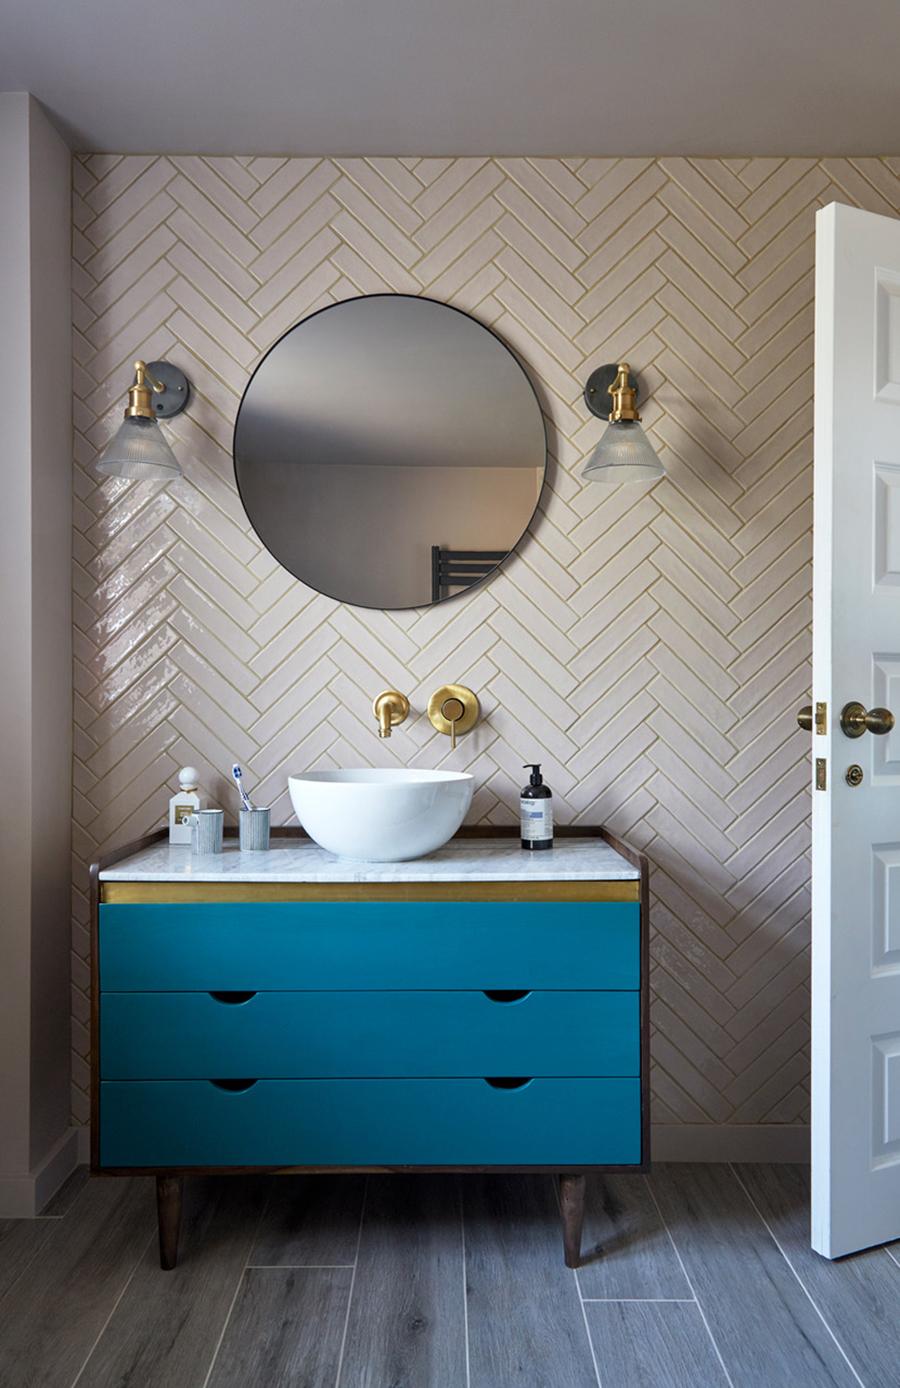 Herringbone pattern tiles with blue vanity contemporary bathroom design